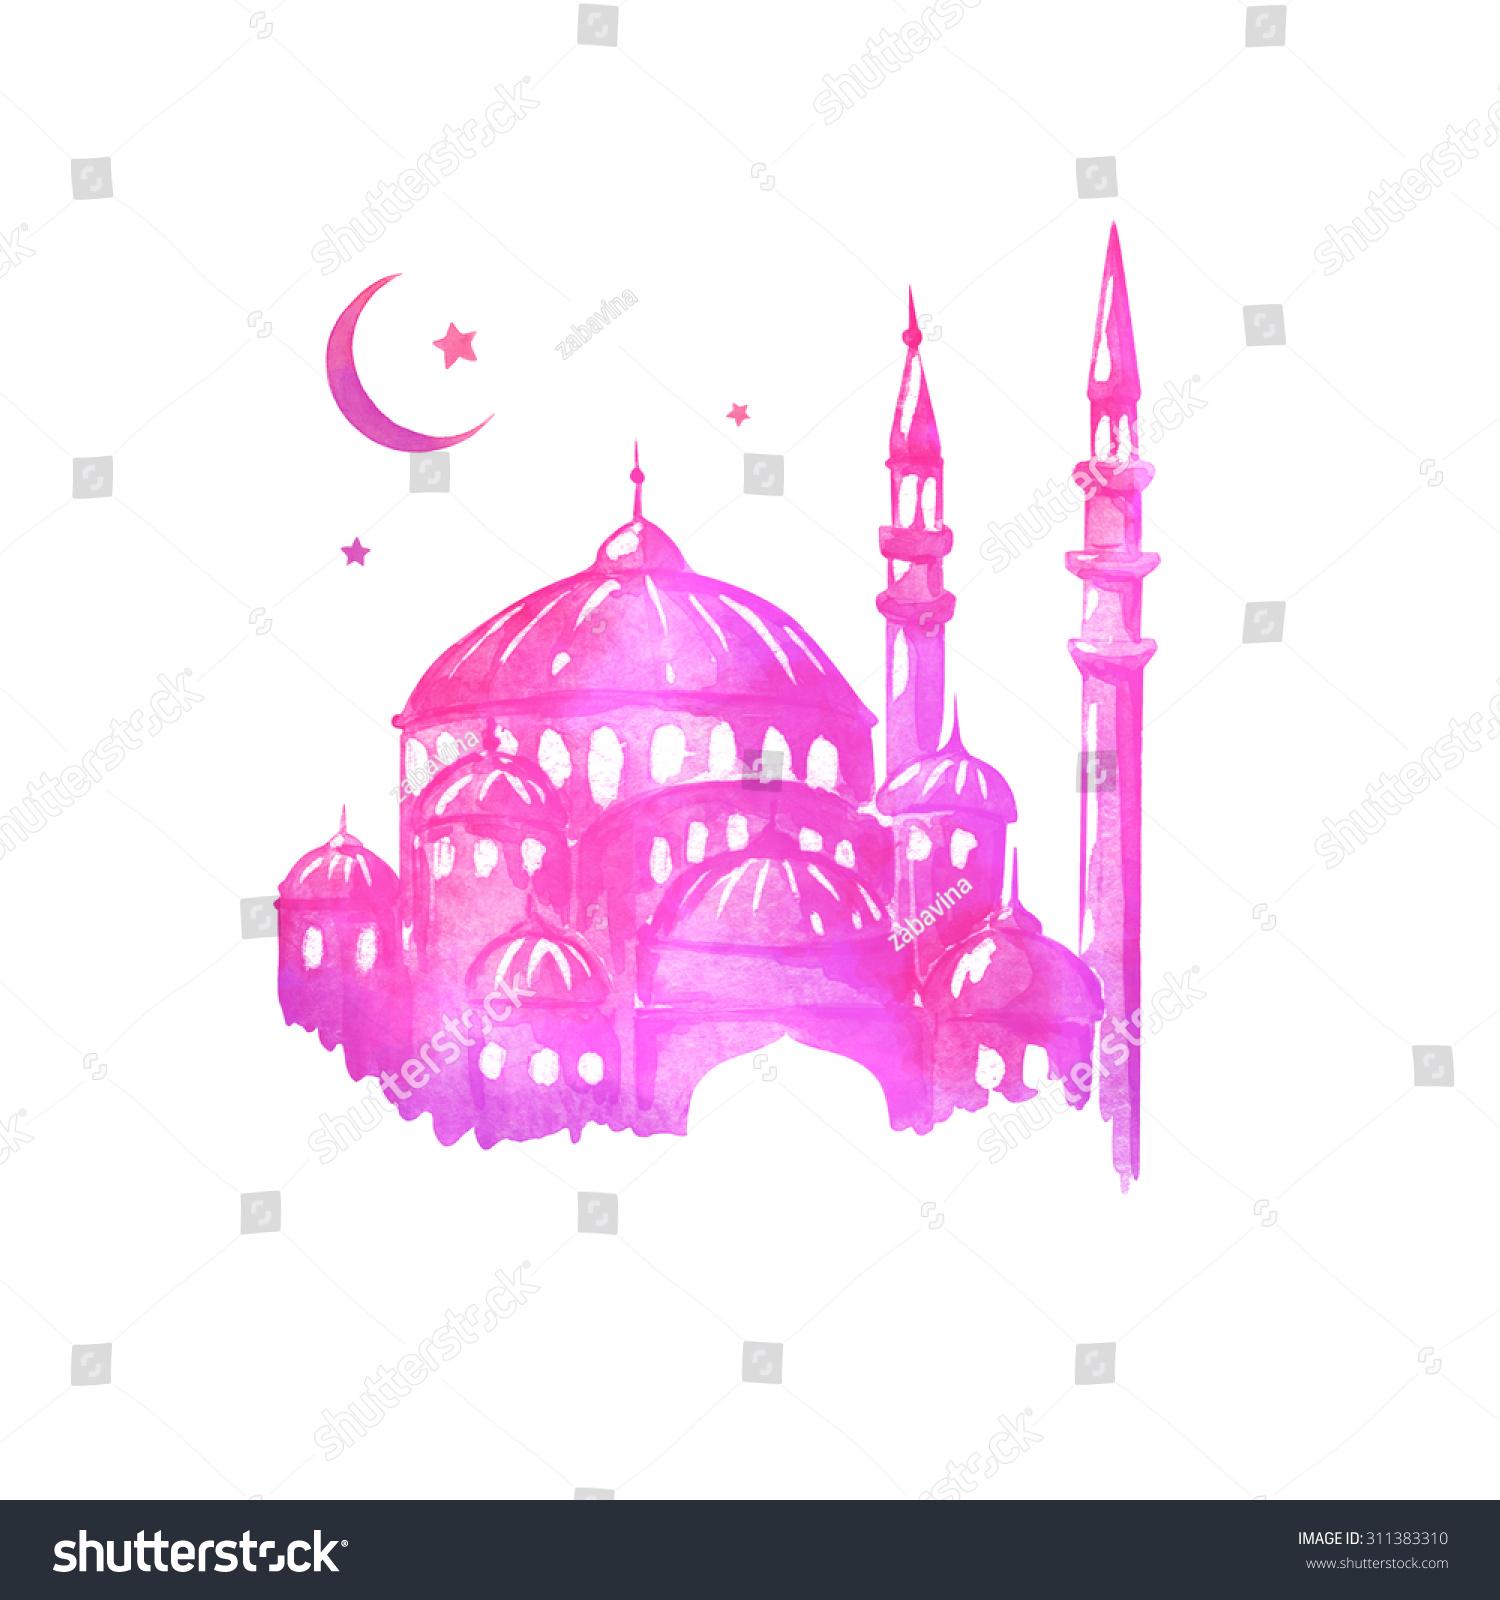 Ramadan kareem eid al adha muslim stock illustration 311383310 eid al adha muslim holiday mosque night ramazan greetings kristyandbryce Choice Image